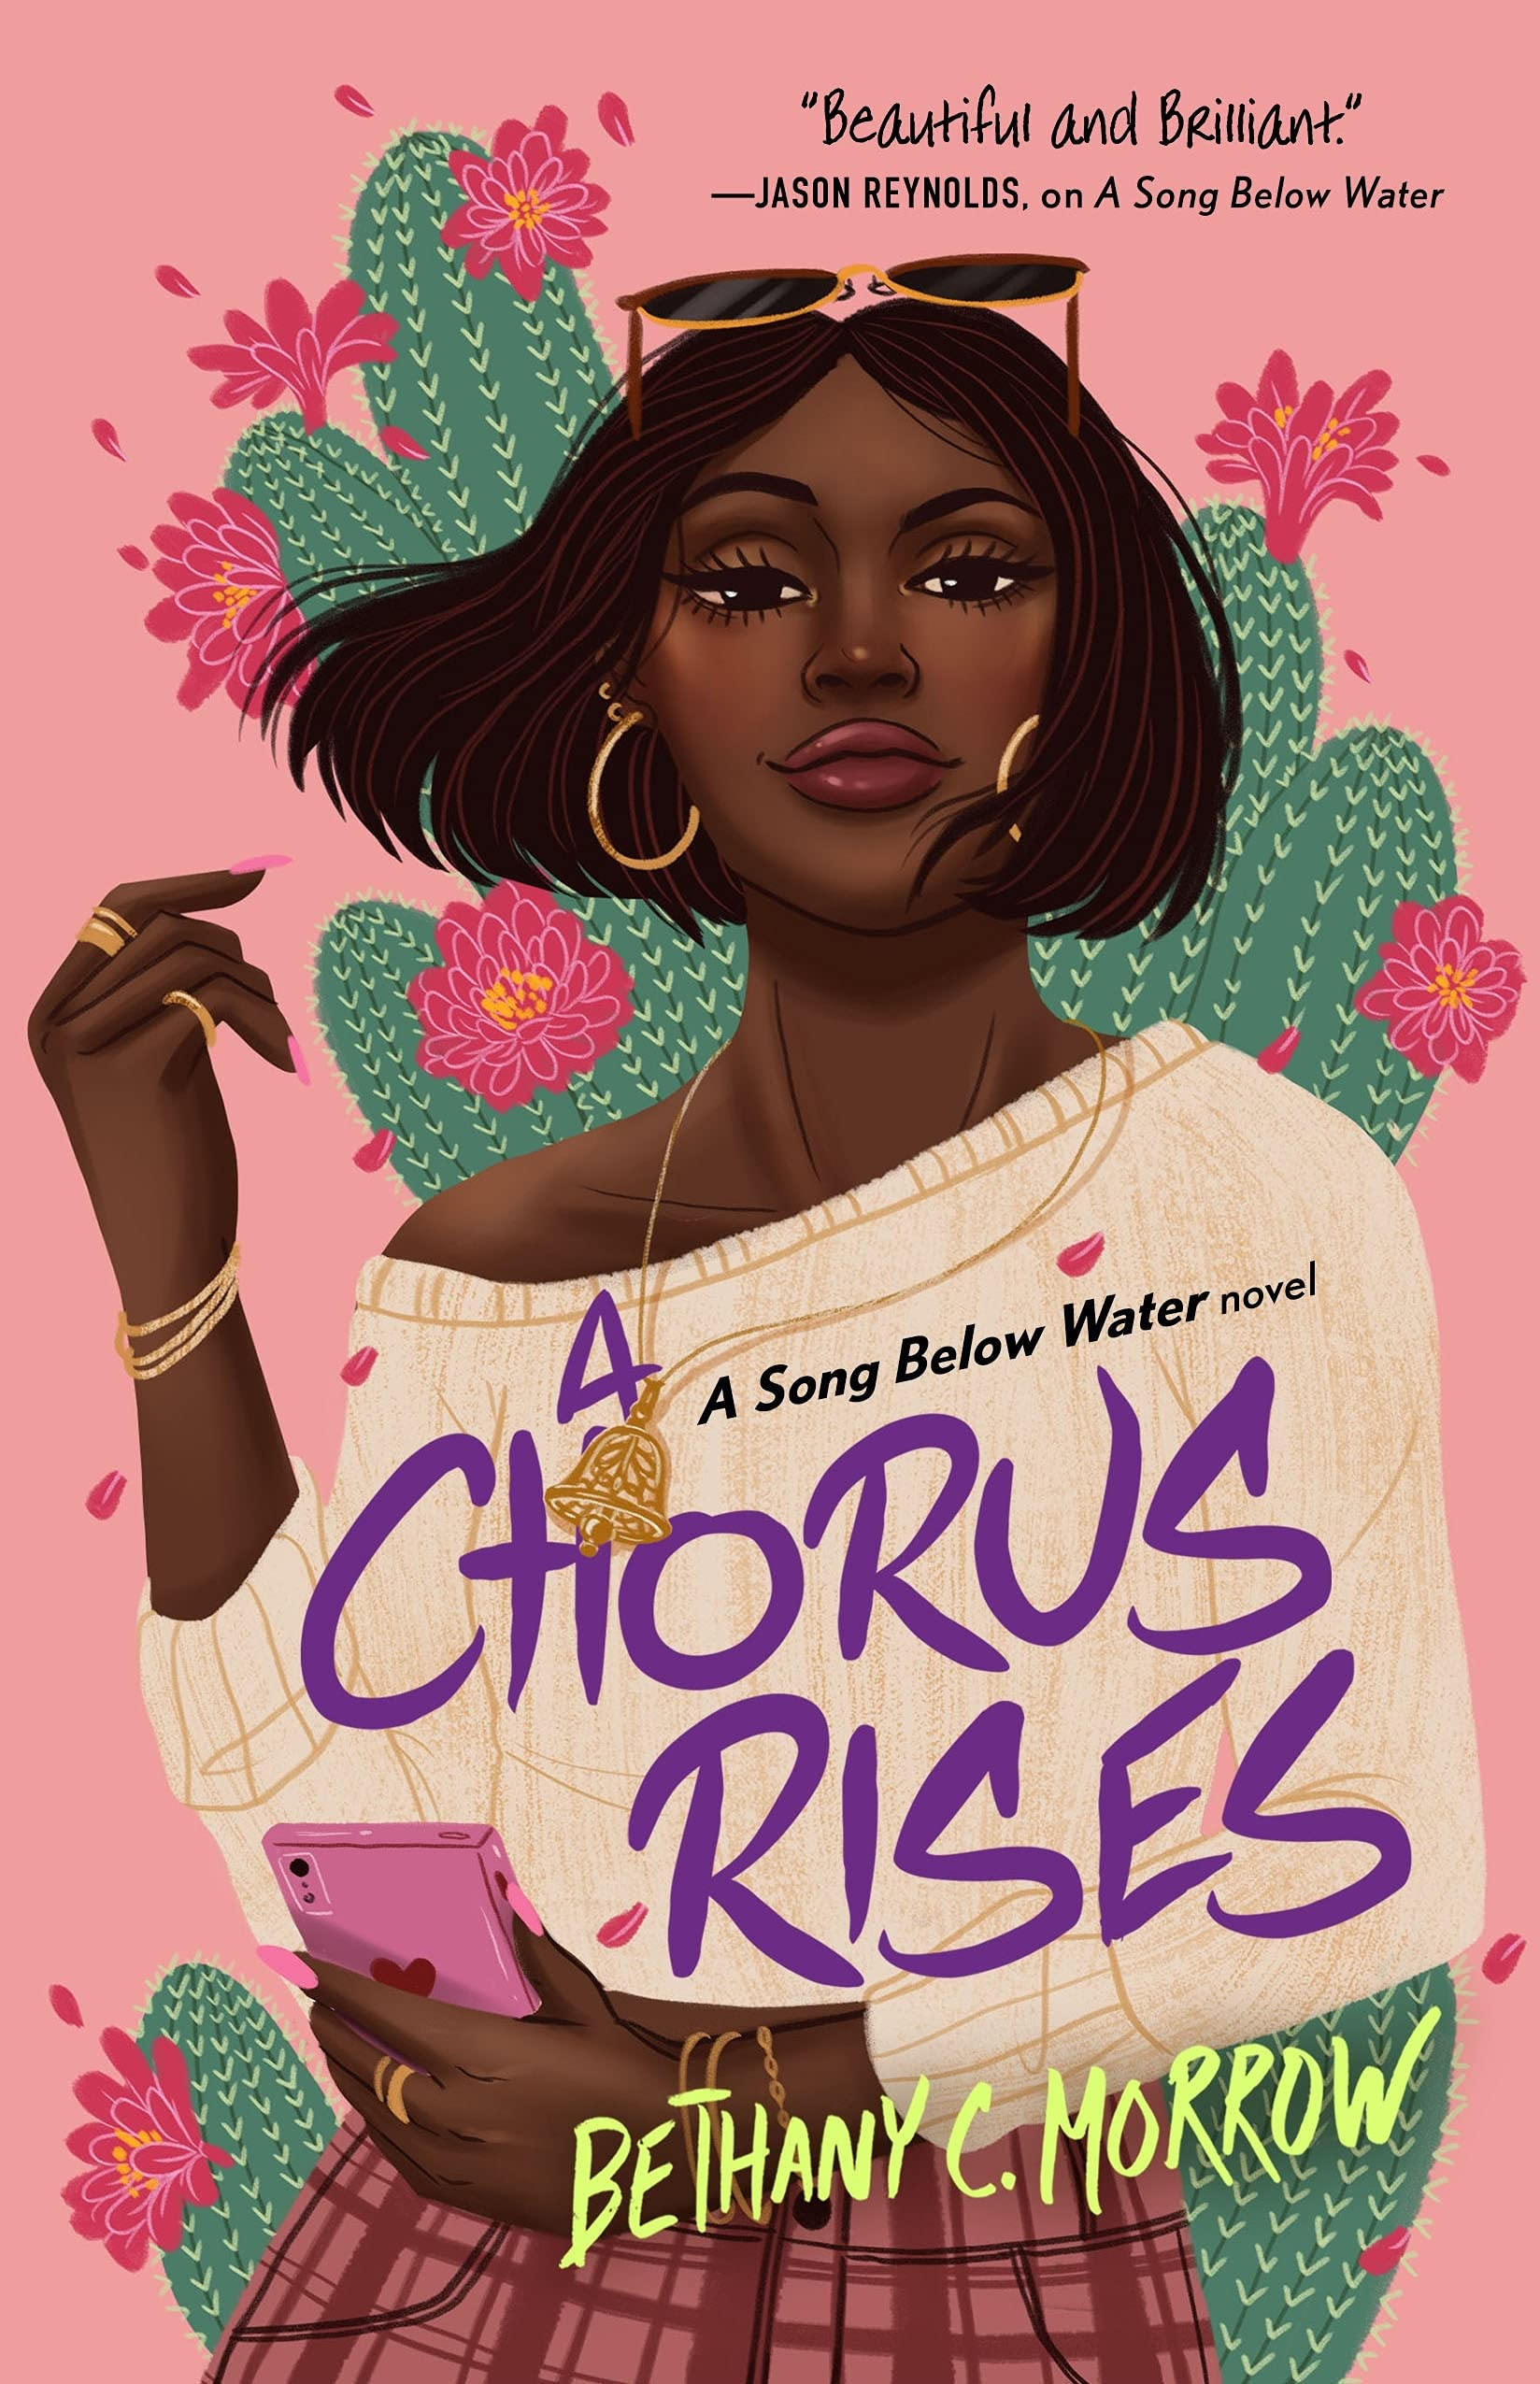 Amazon.com: A Chorus Rises: A Song Below Water novel (9781250316035): Morrow,  Bethany C.: Books